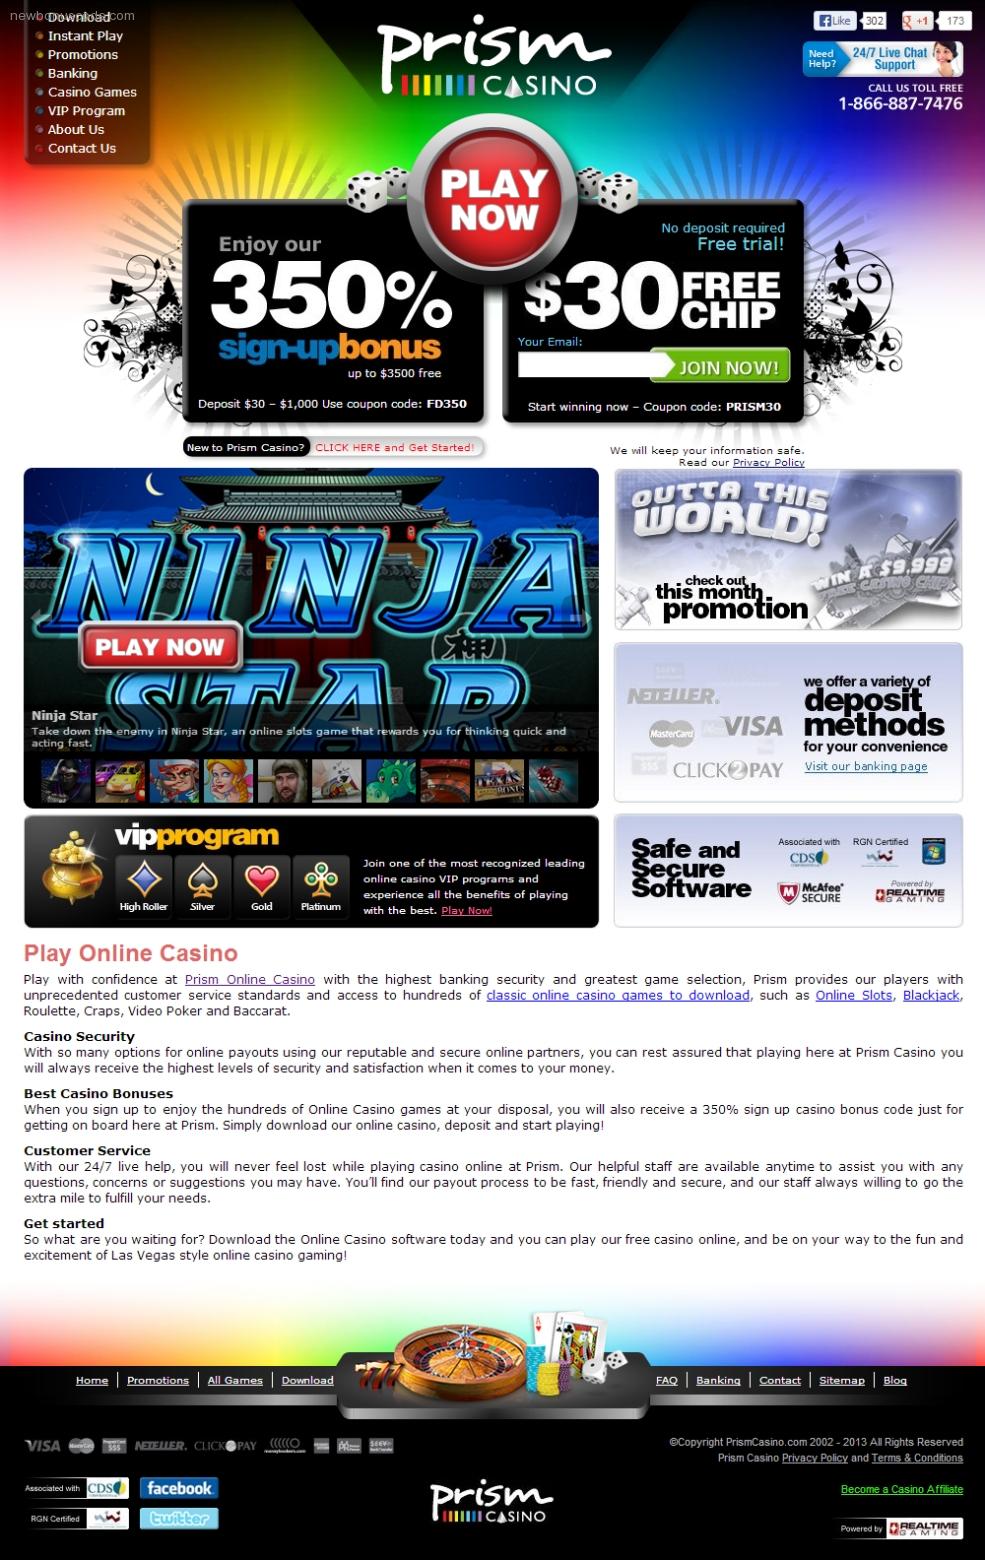 prism casino big free chip list